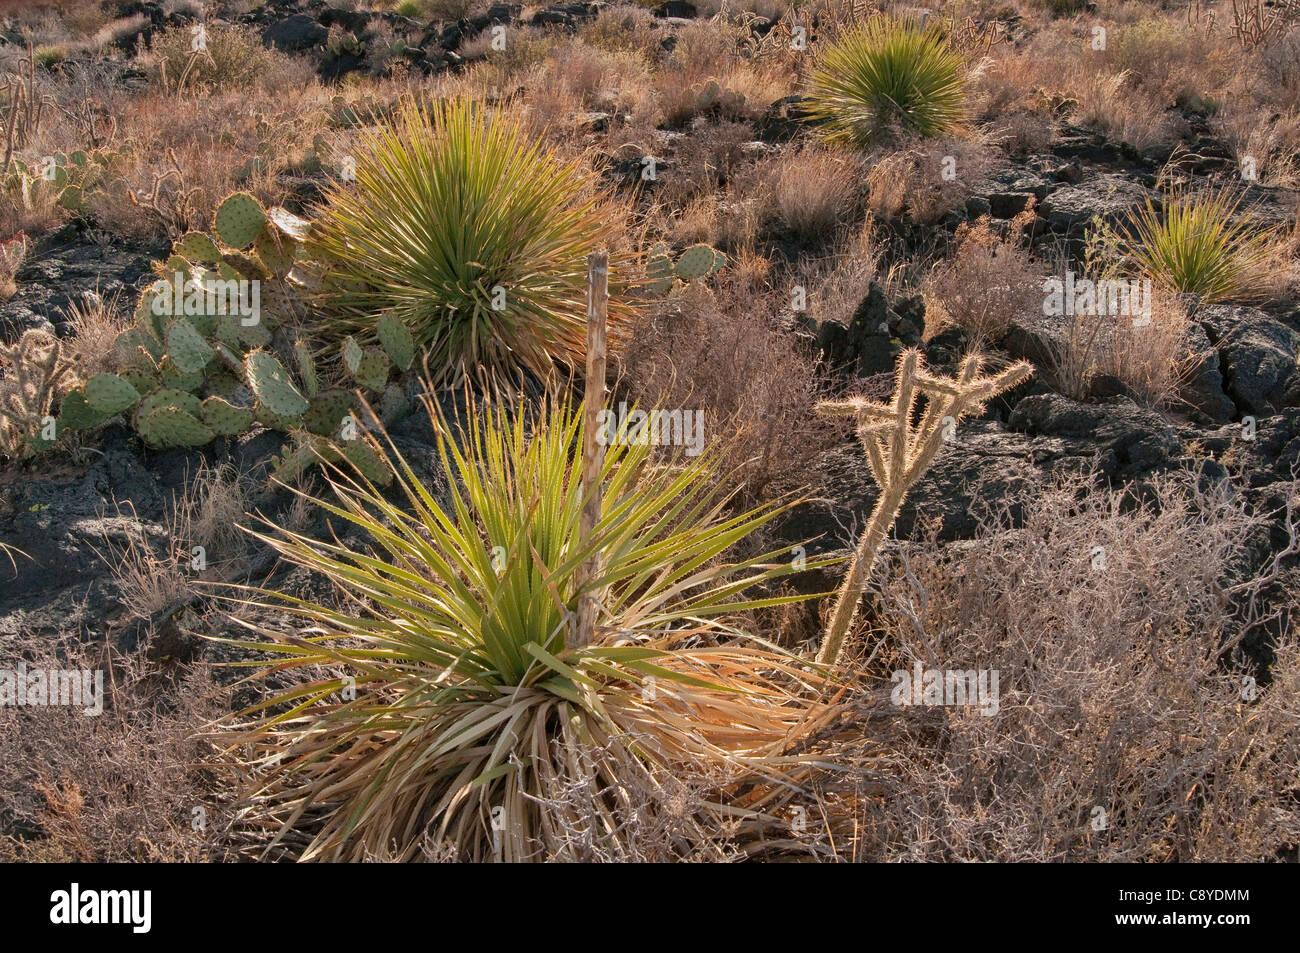 Sotol and cacti in lava field, Carrizozo Malpais lava flow at Valley of Fires, Tularosa Basin near Carrizozo, New - Stock Image